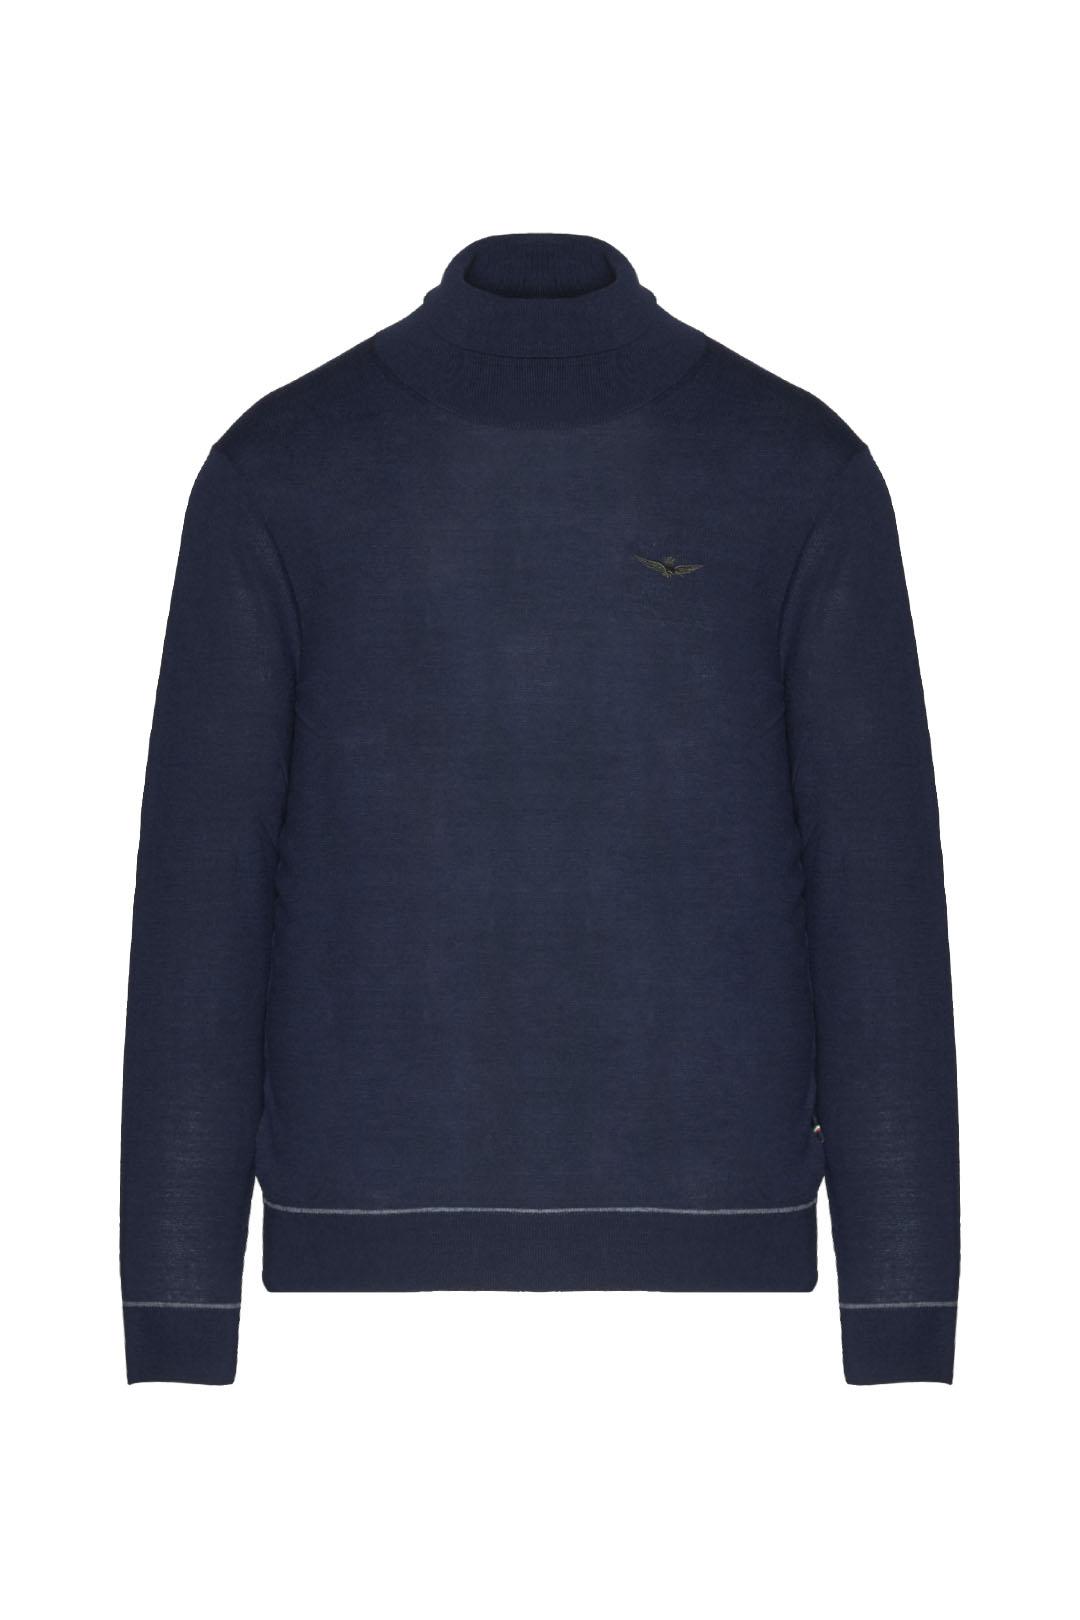 Merino wool blend turtleneck sweater